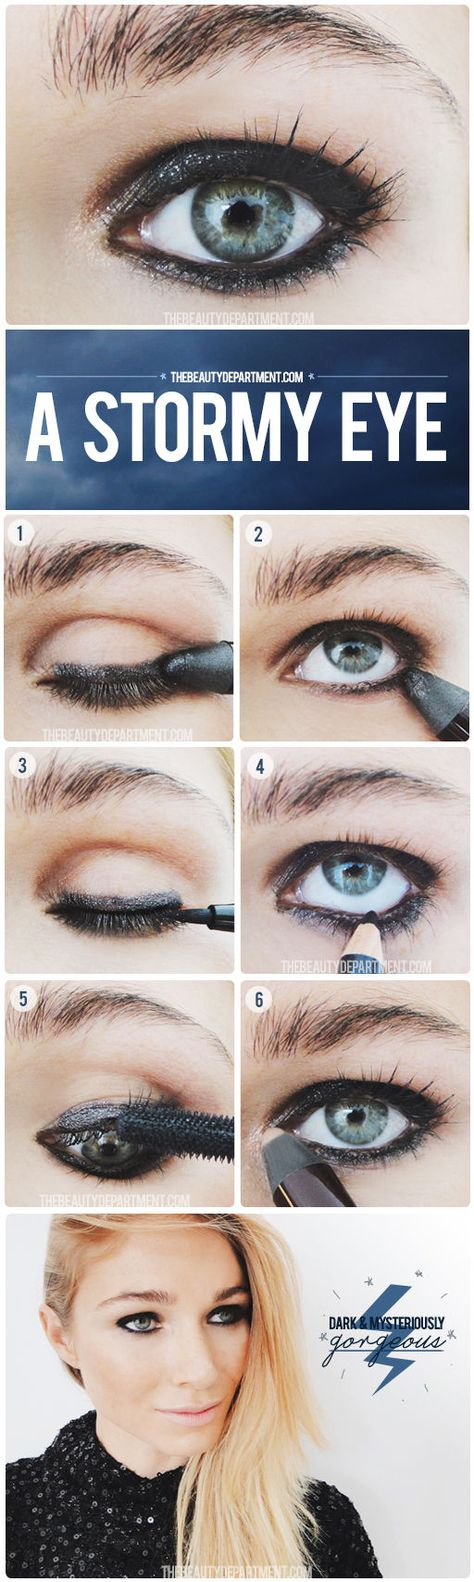 Stormy eye how-to. (Grab cruelty-free mascara + eyeliner before you start.) #BeCrueltyFree